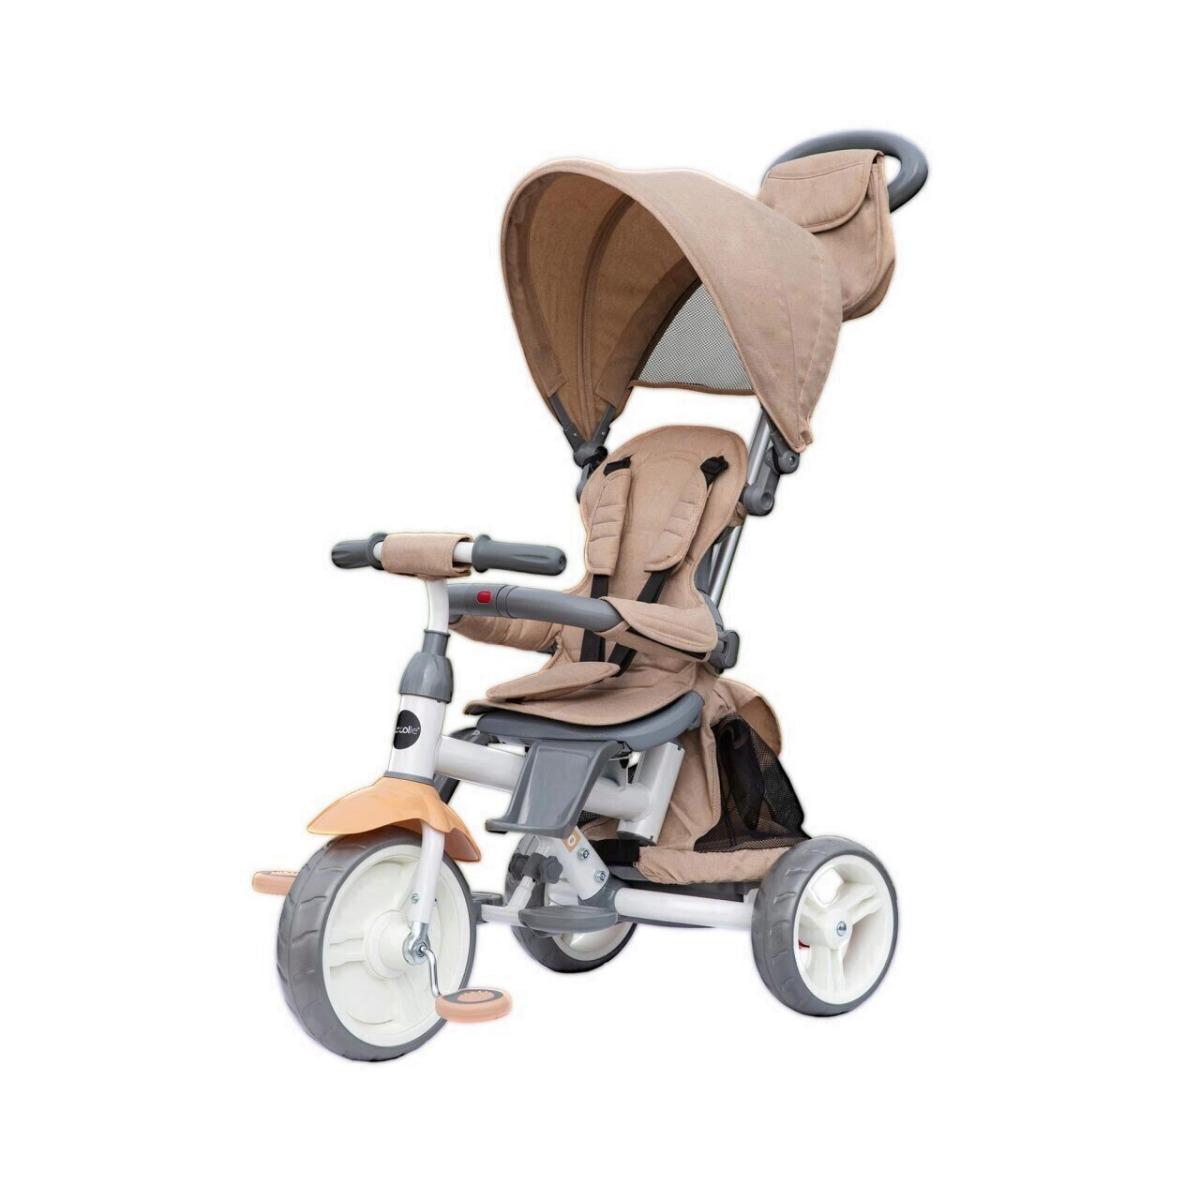 Tricicleta multifunctionala Evo Coccolle, Bej